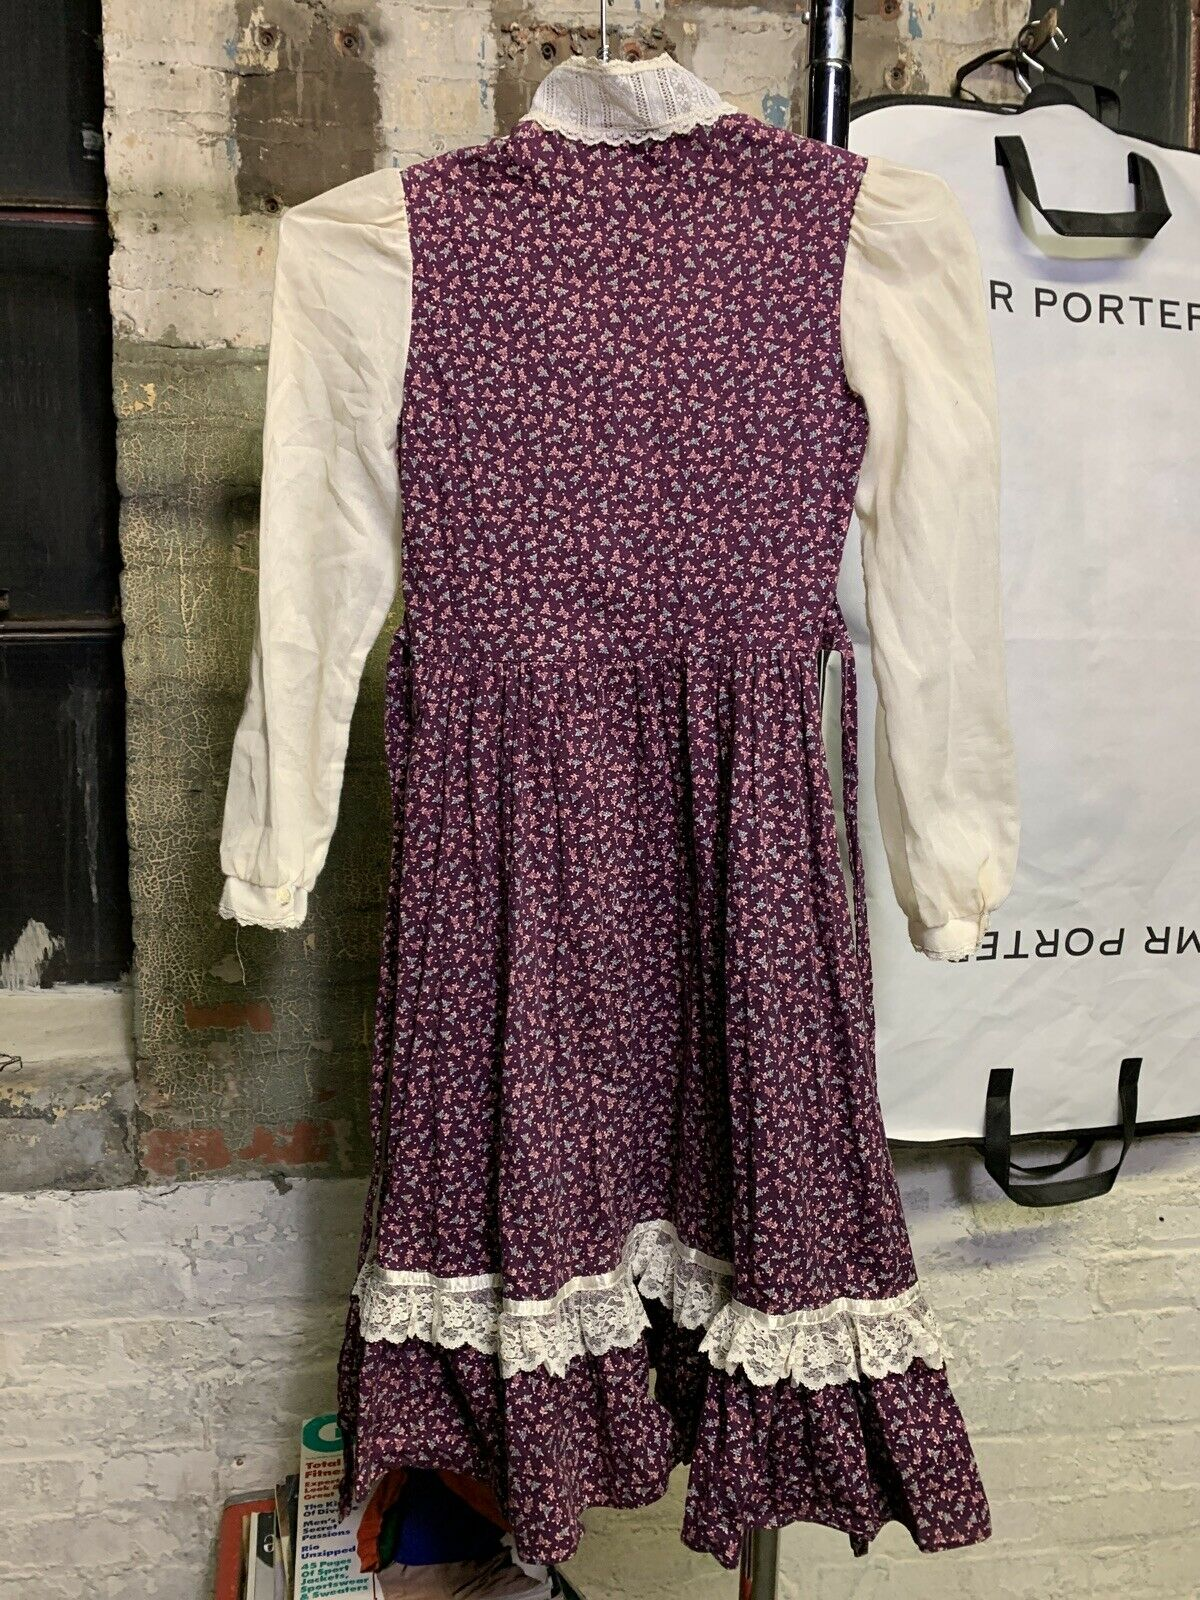 gunne sax 1970s women's vintage dress - image 9